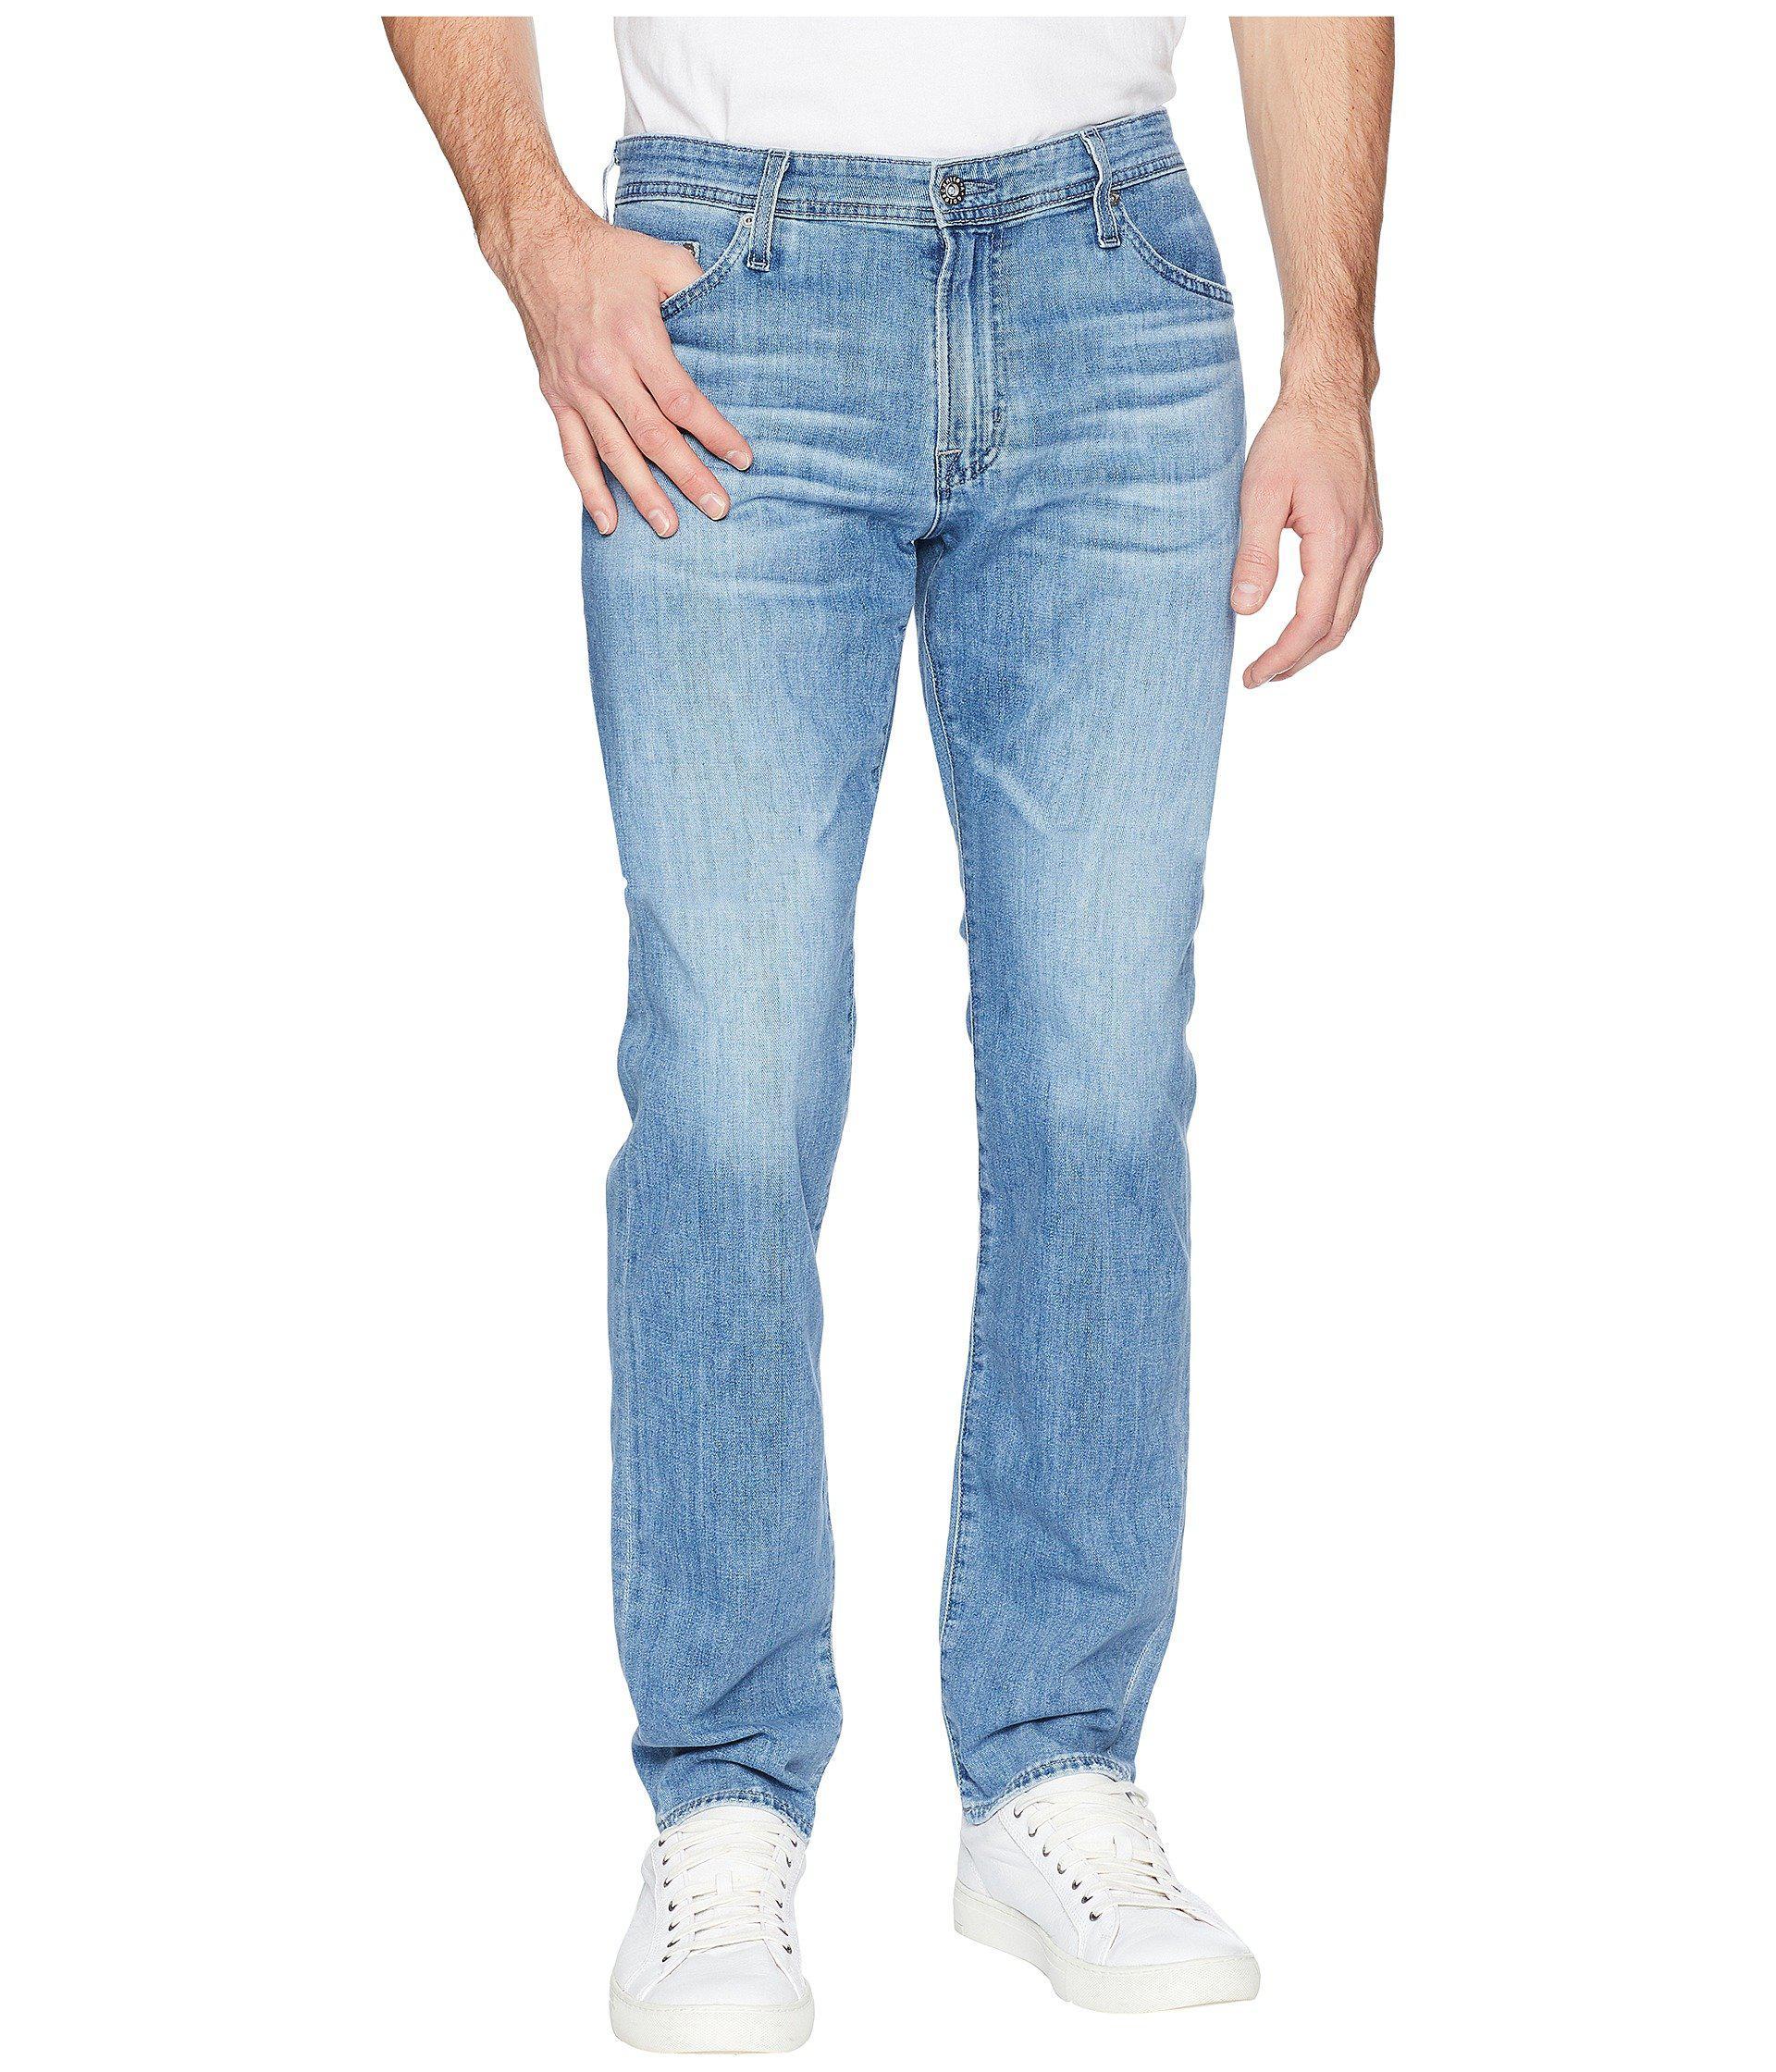 AG Adriano Goldschmied Mens The Graduate Tailored Leg Denim Jean